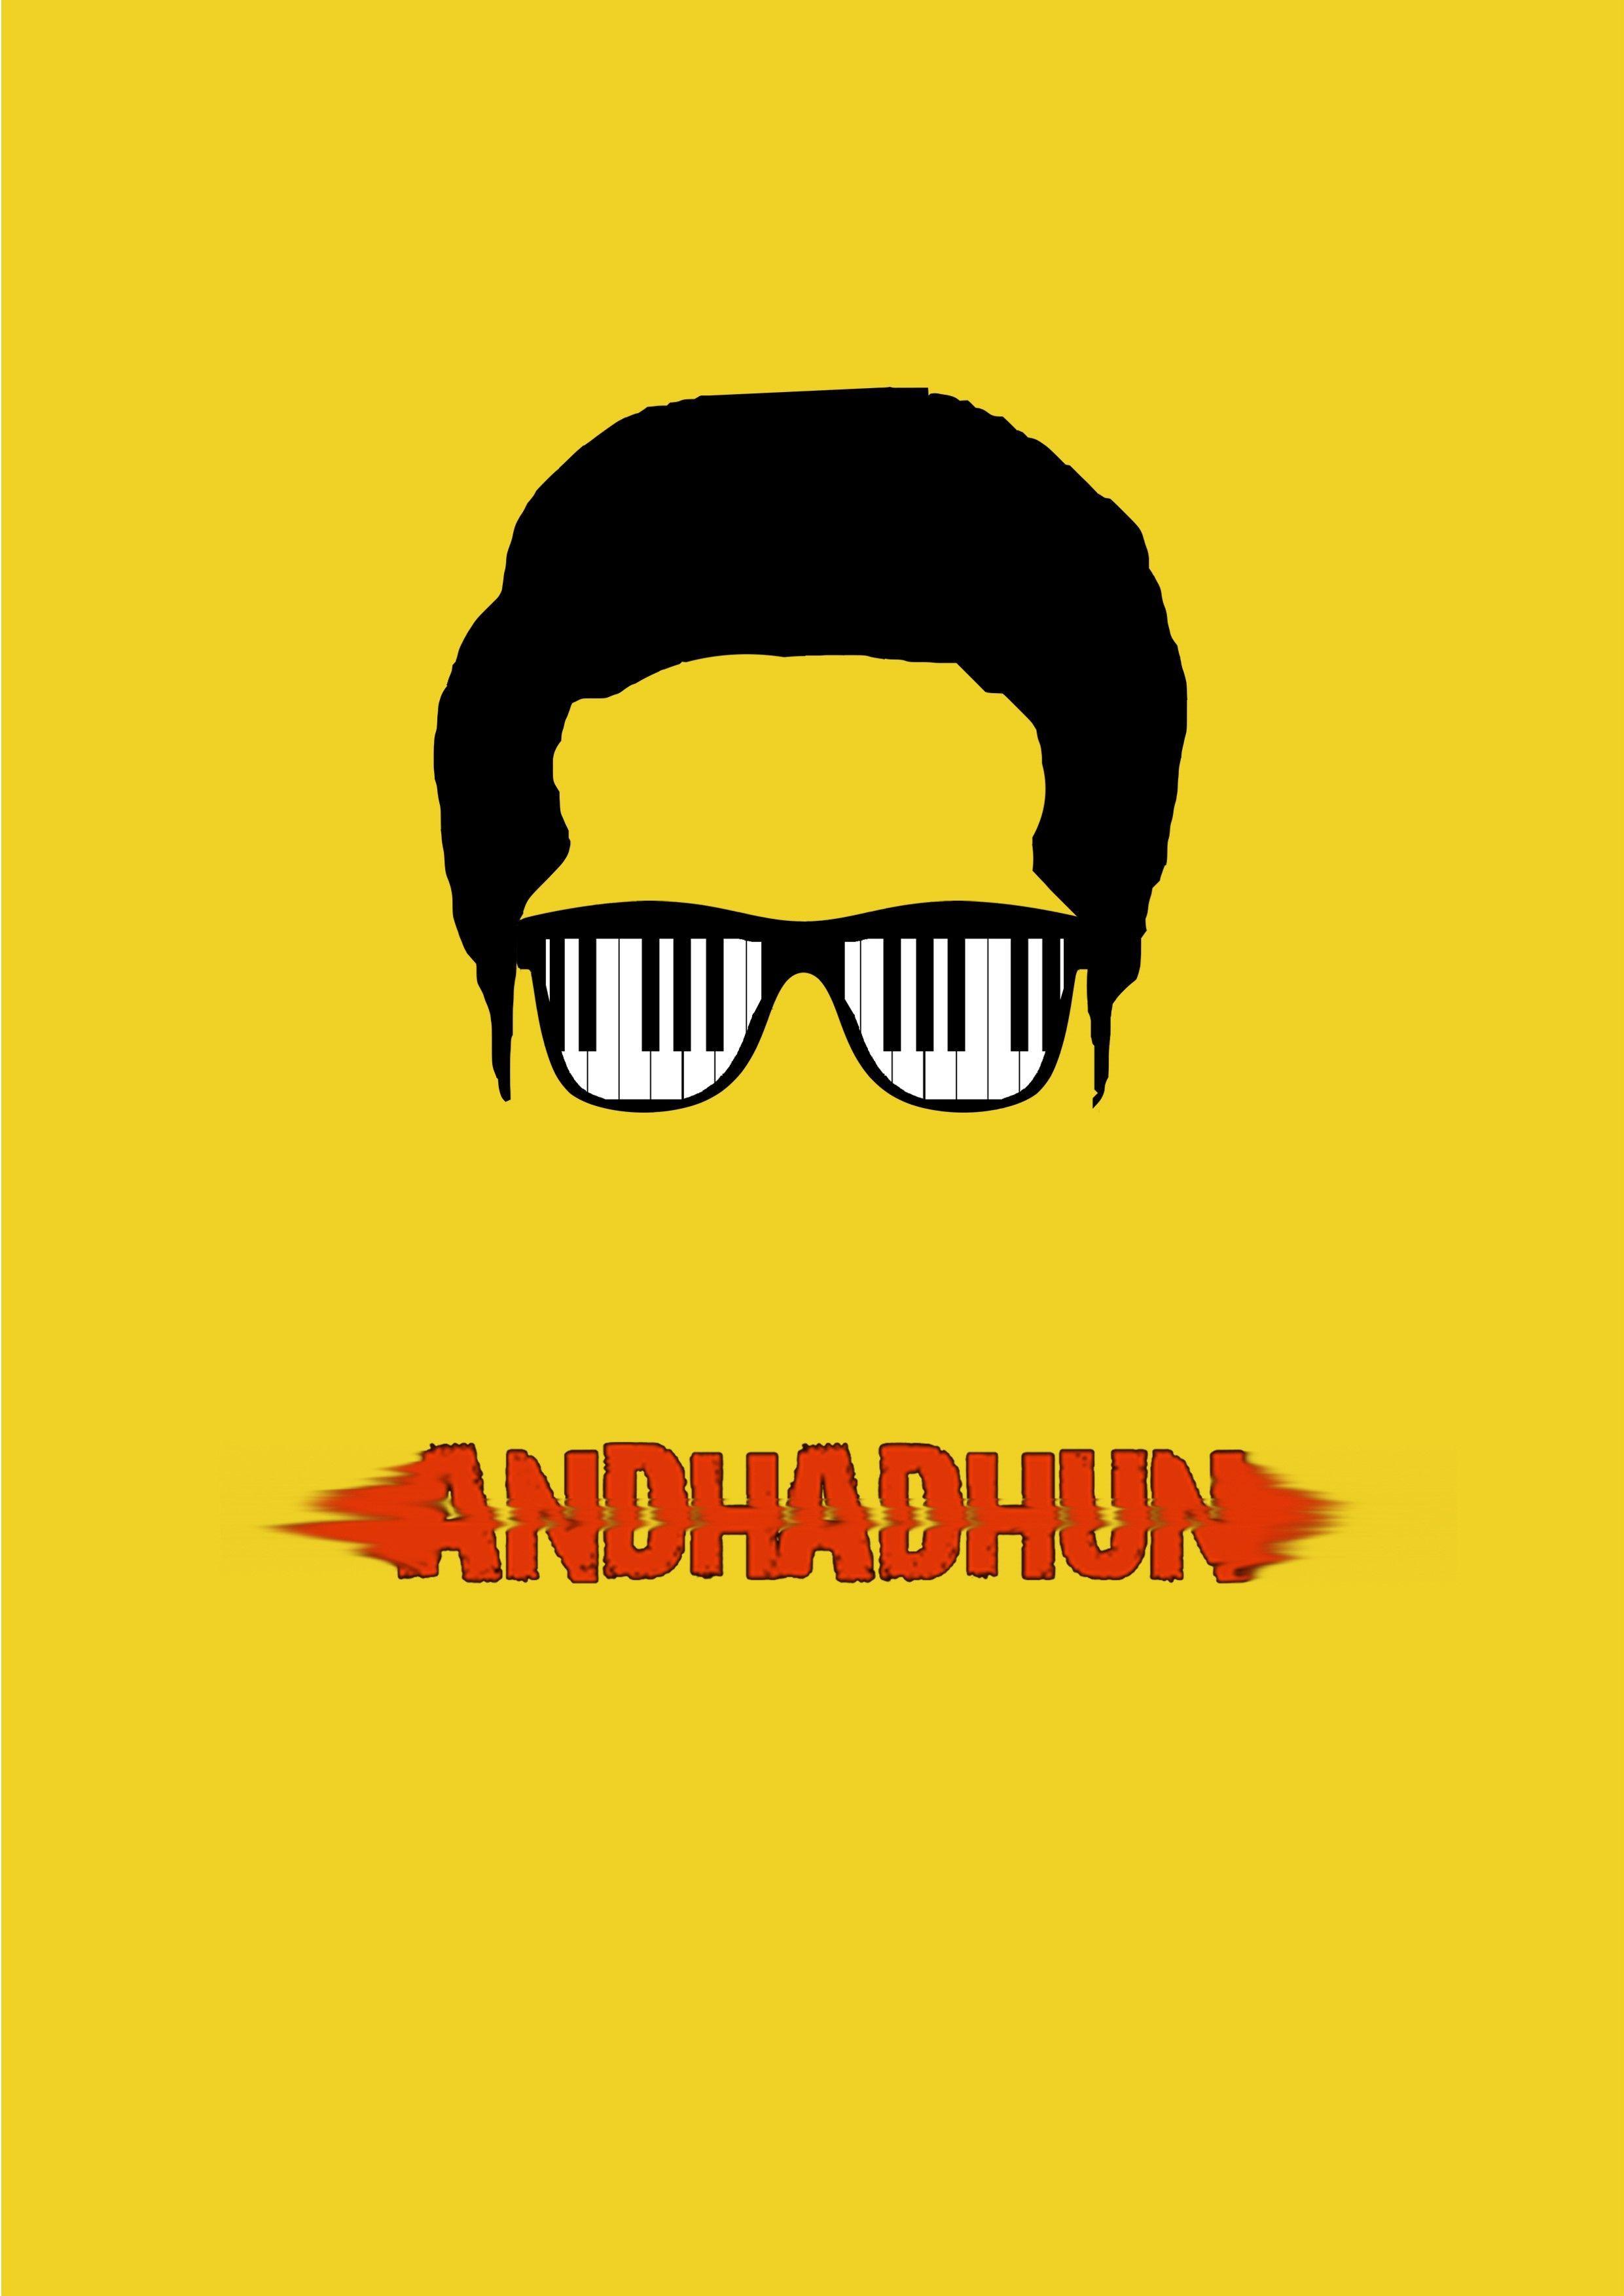 Andhadhun 2018 Minimal Movie Poster In 2020 Movie Posters Minimalist Iconic Movie Posters Movie Posters Design